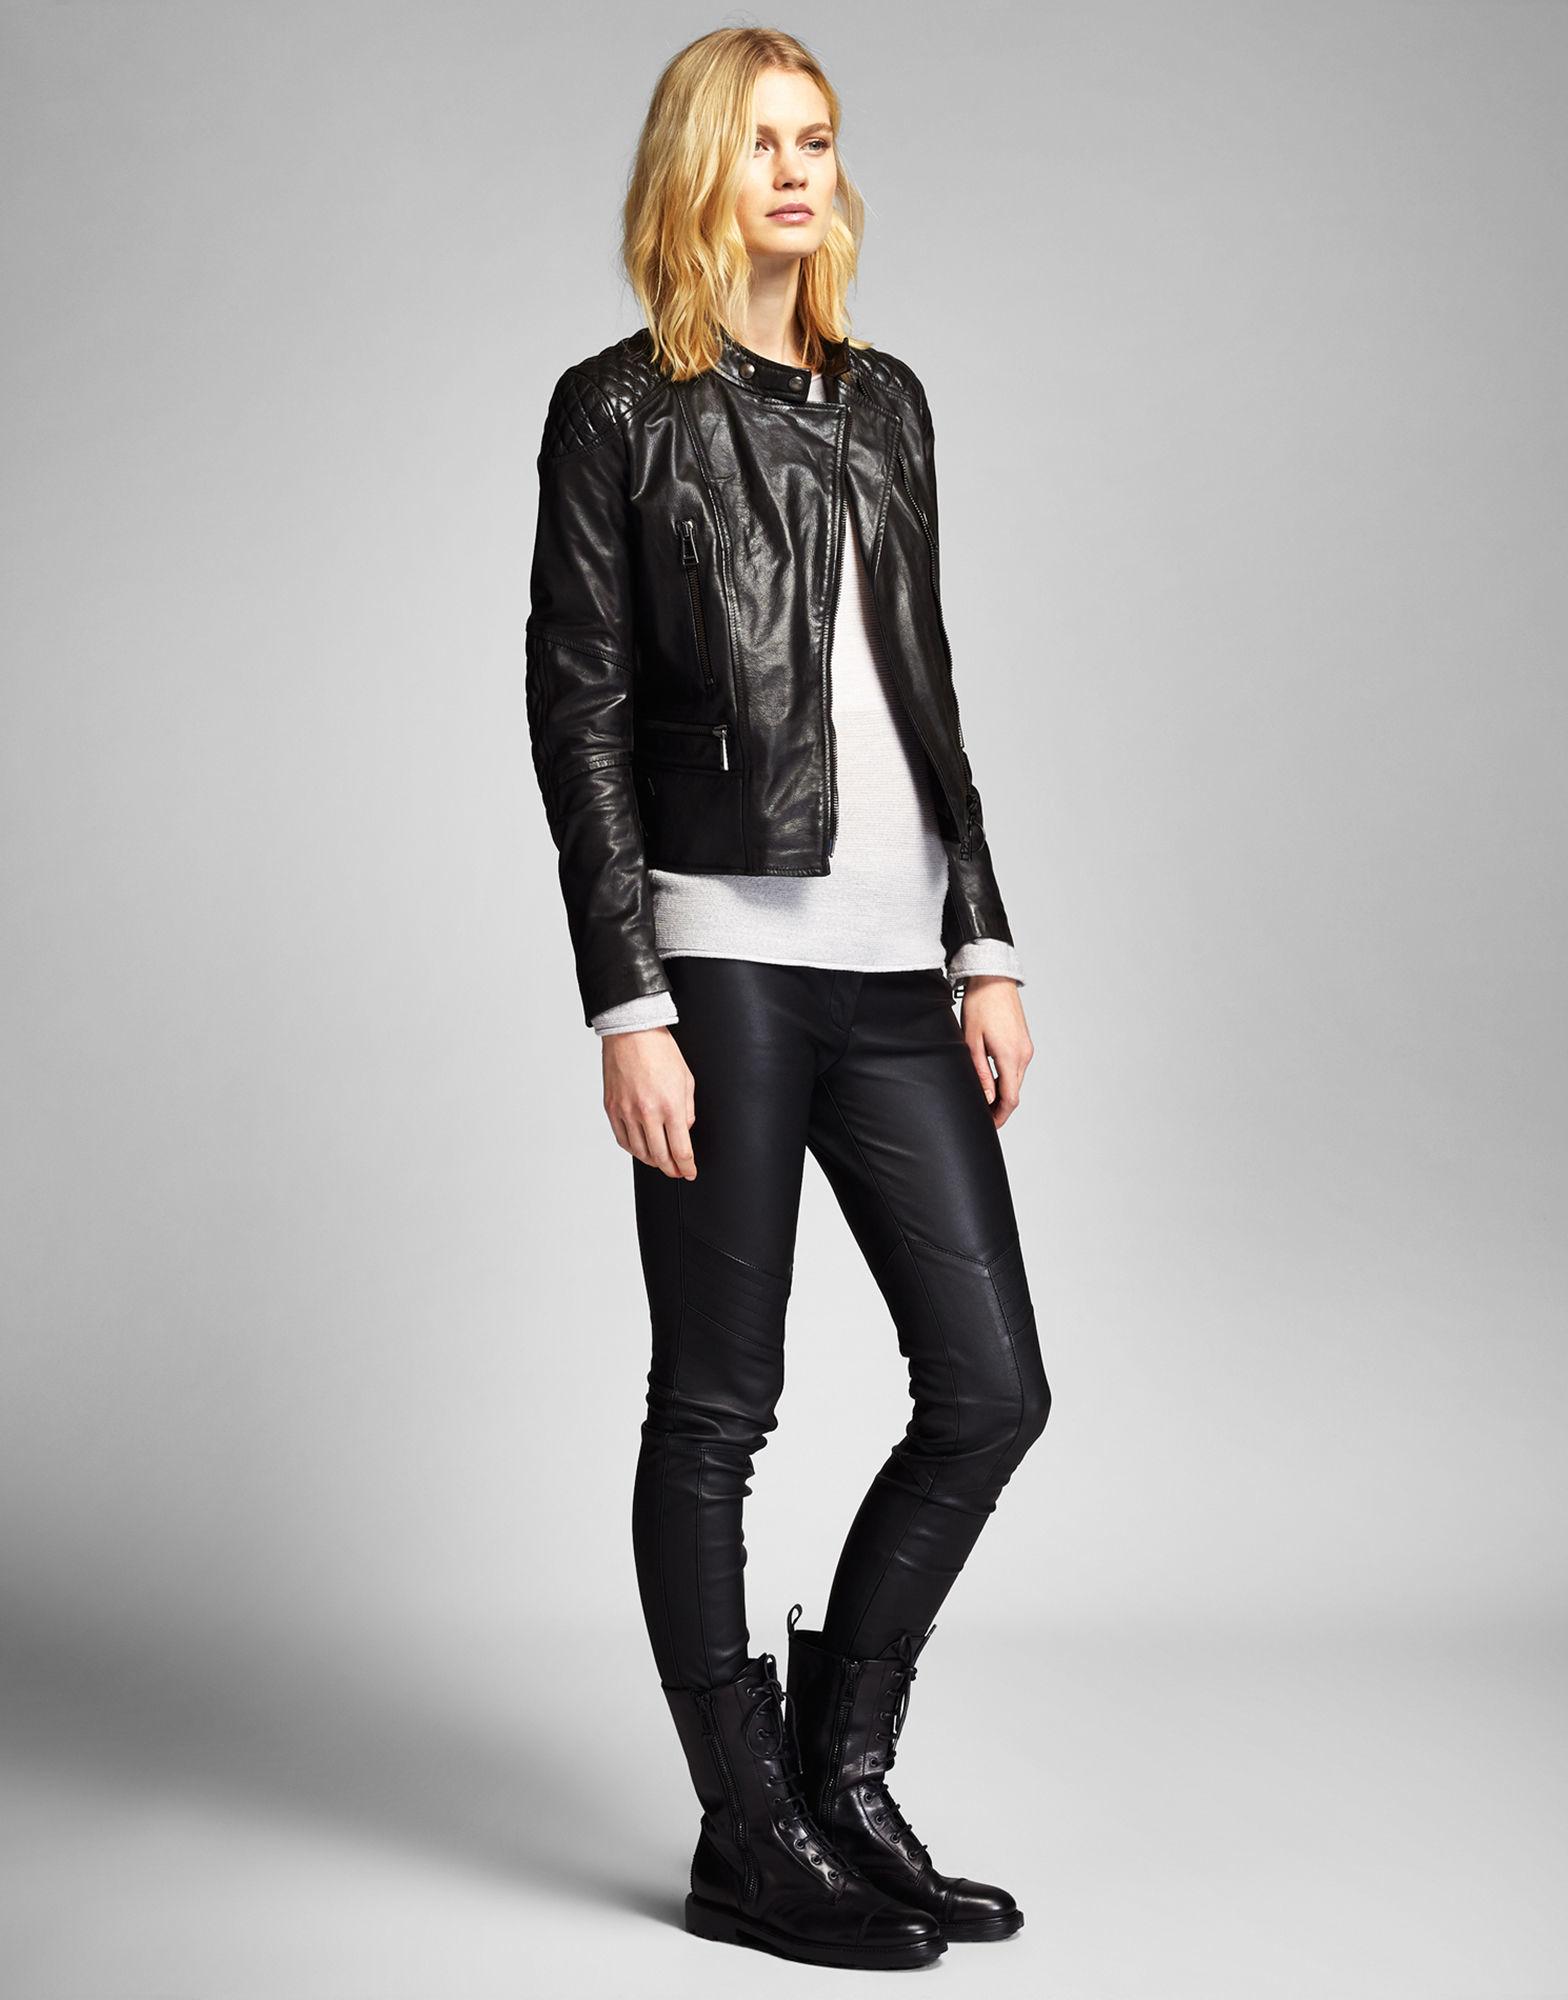 Belstaff Womens Leather Motorcycle Jacket